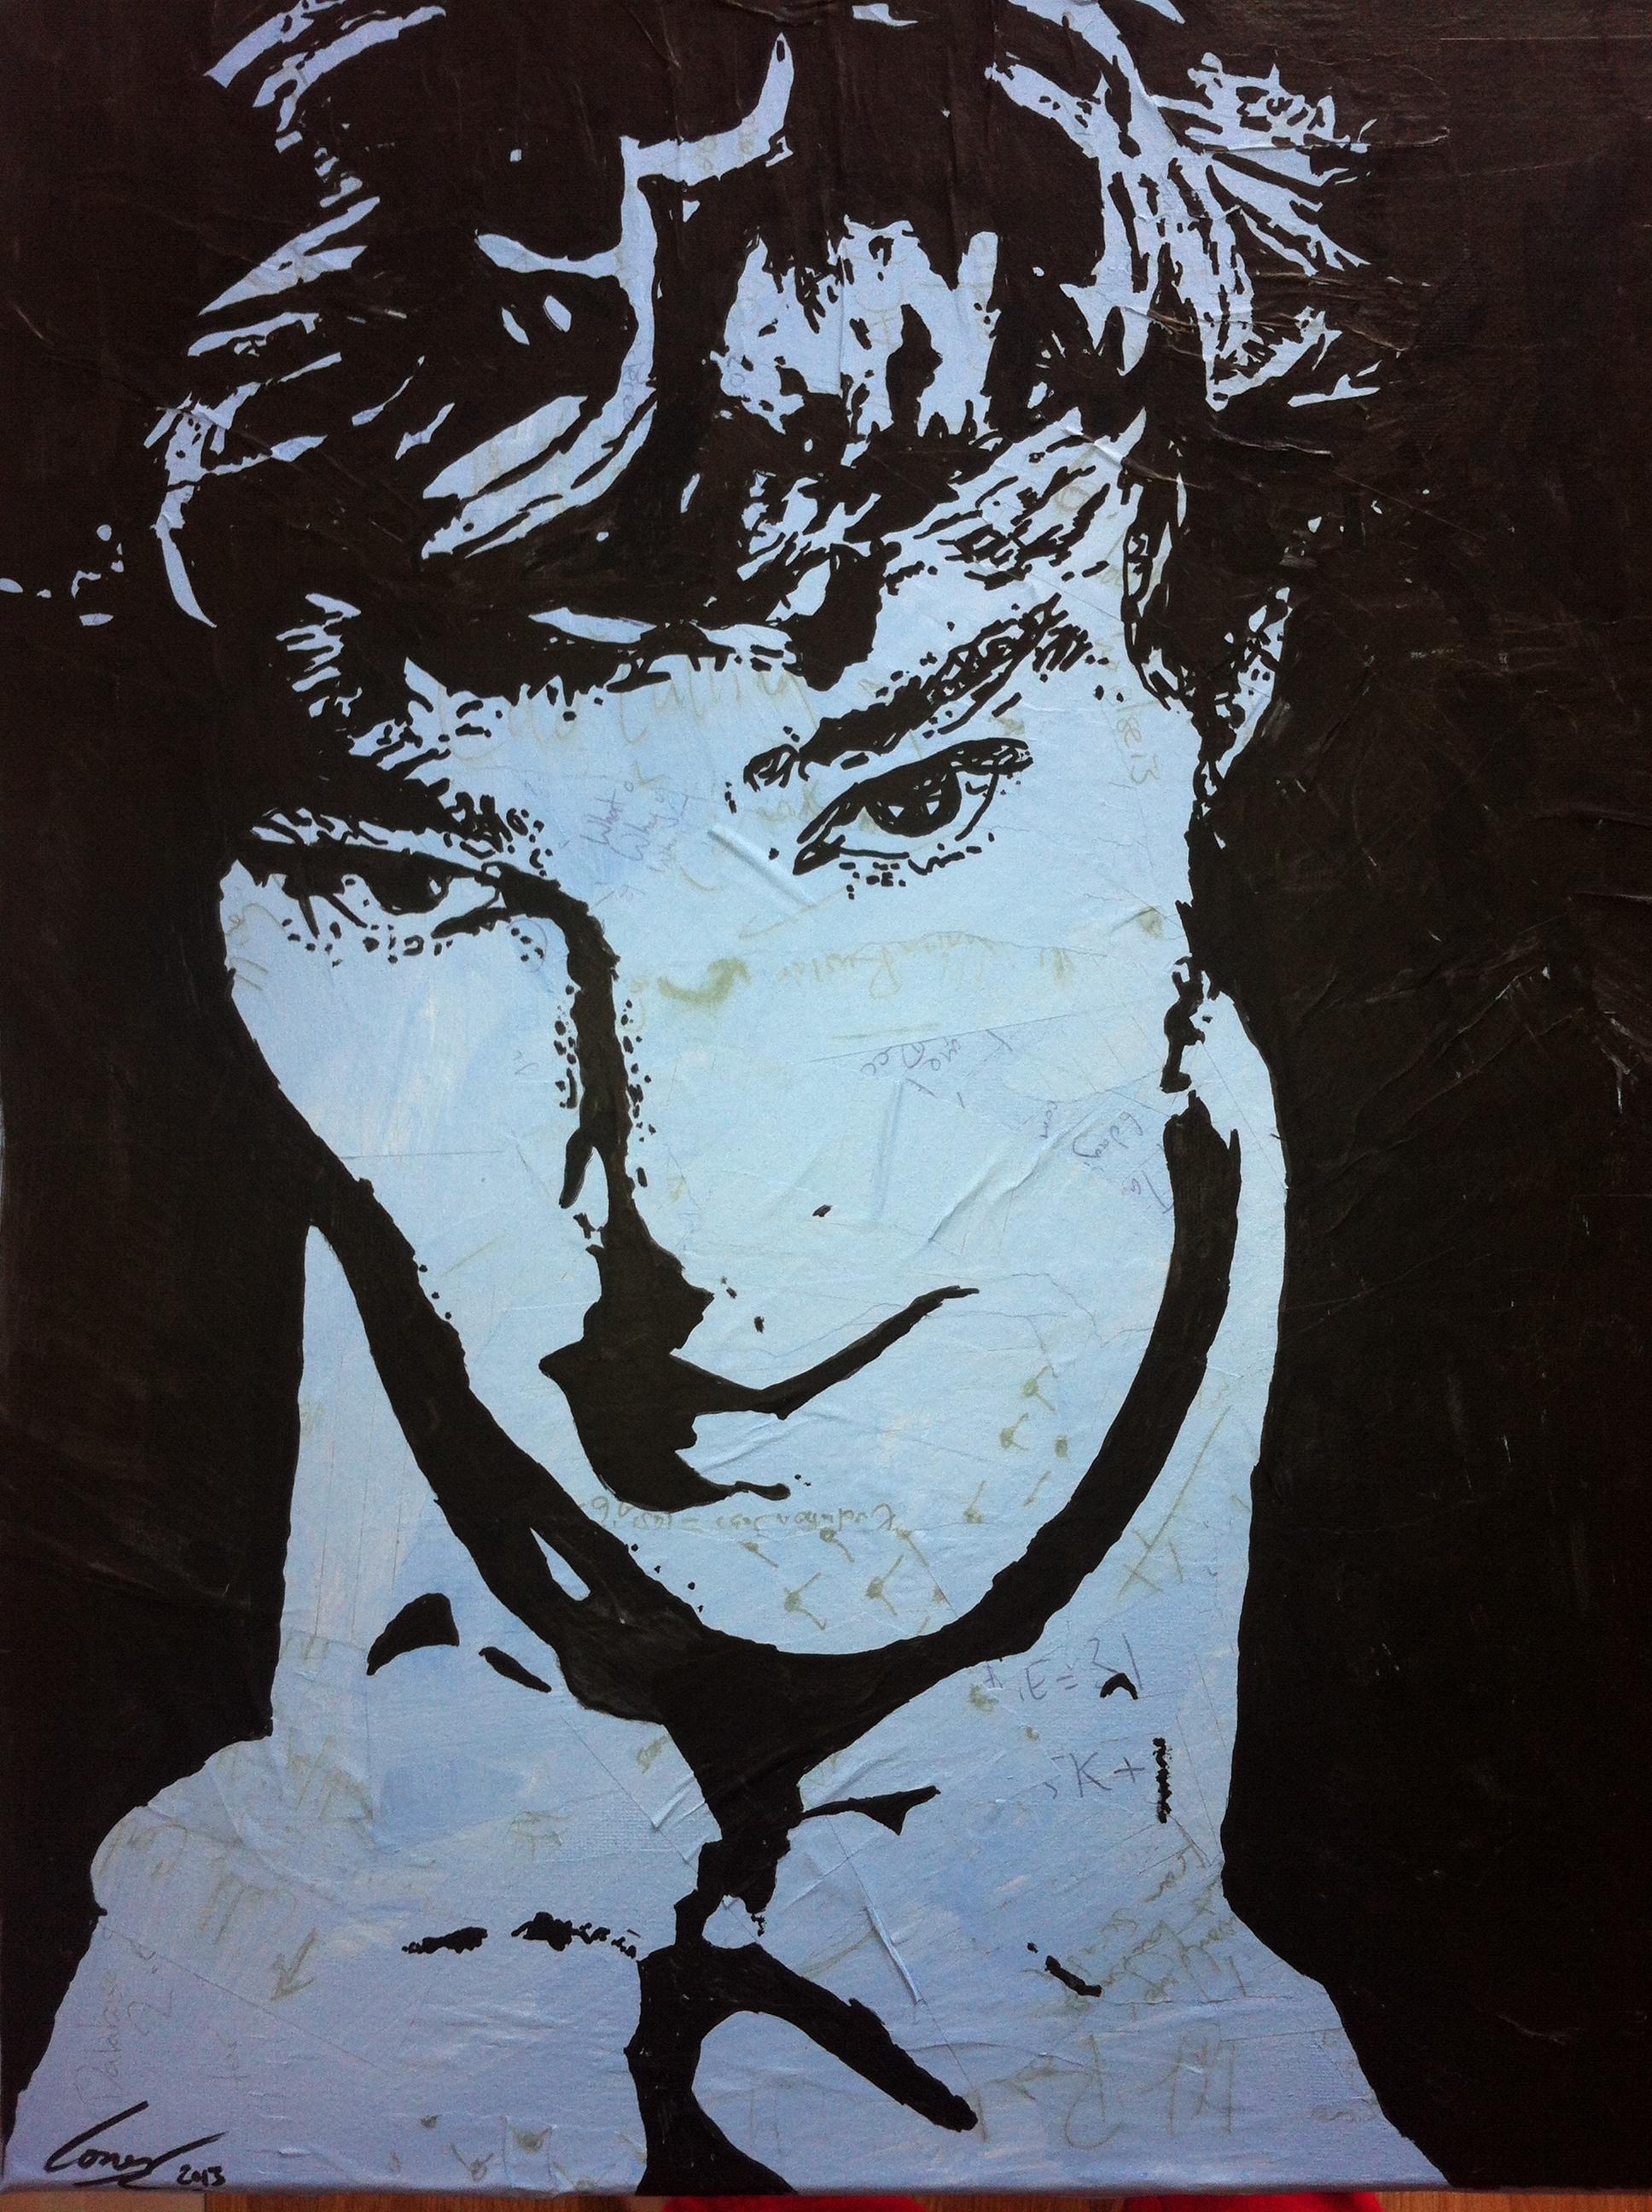 A portrait of Benedict Cumberbatch